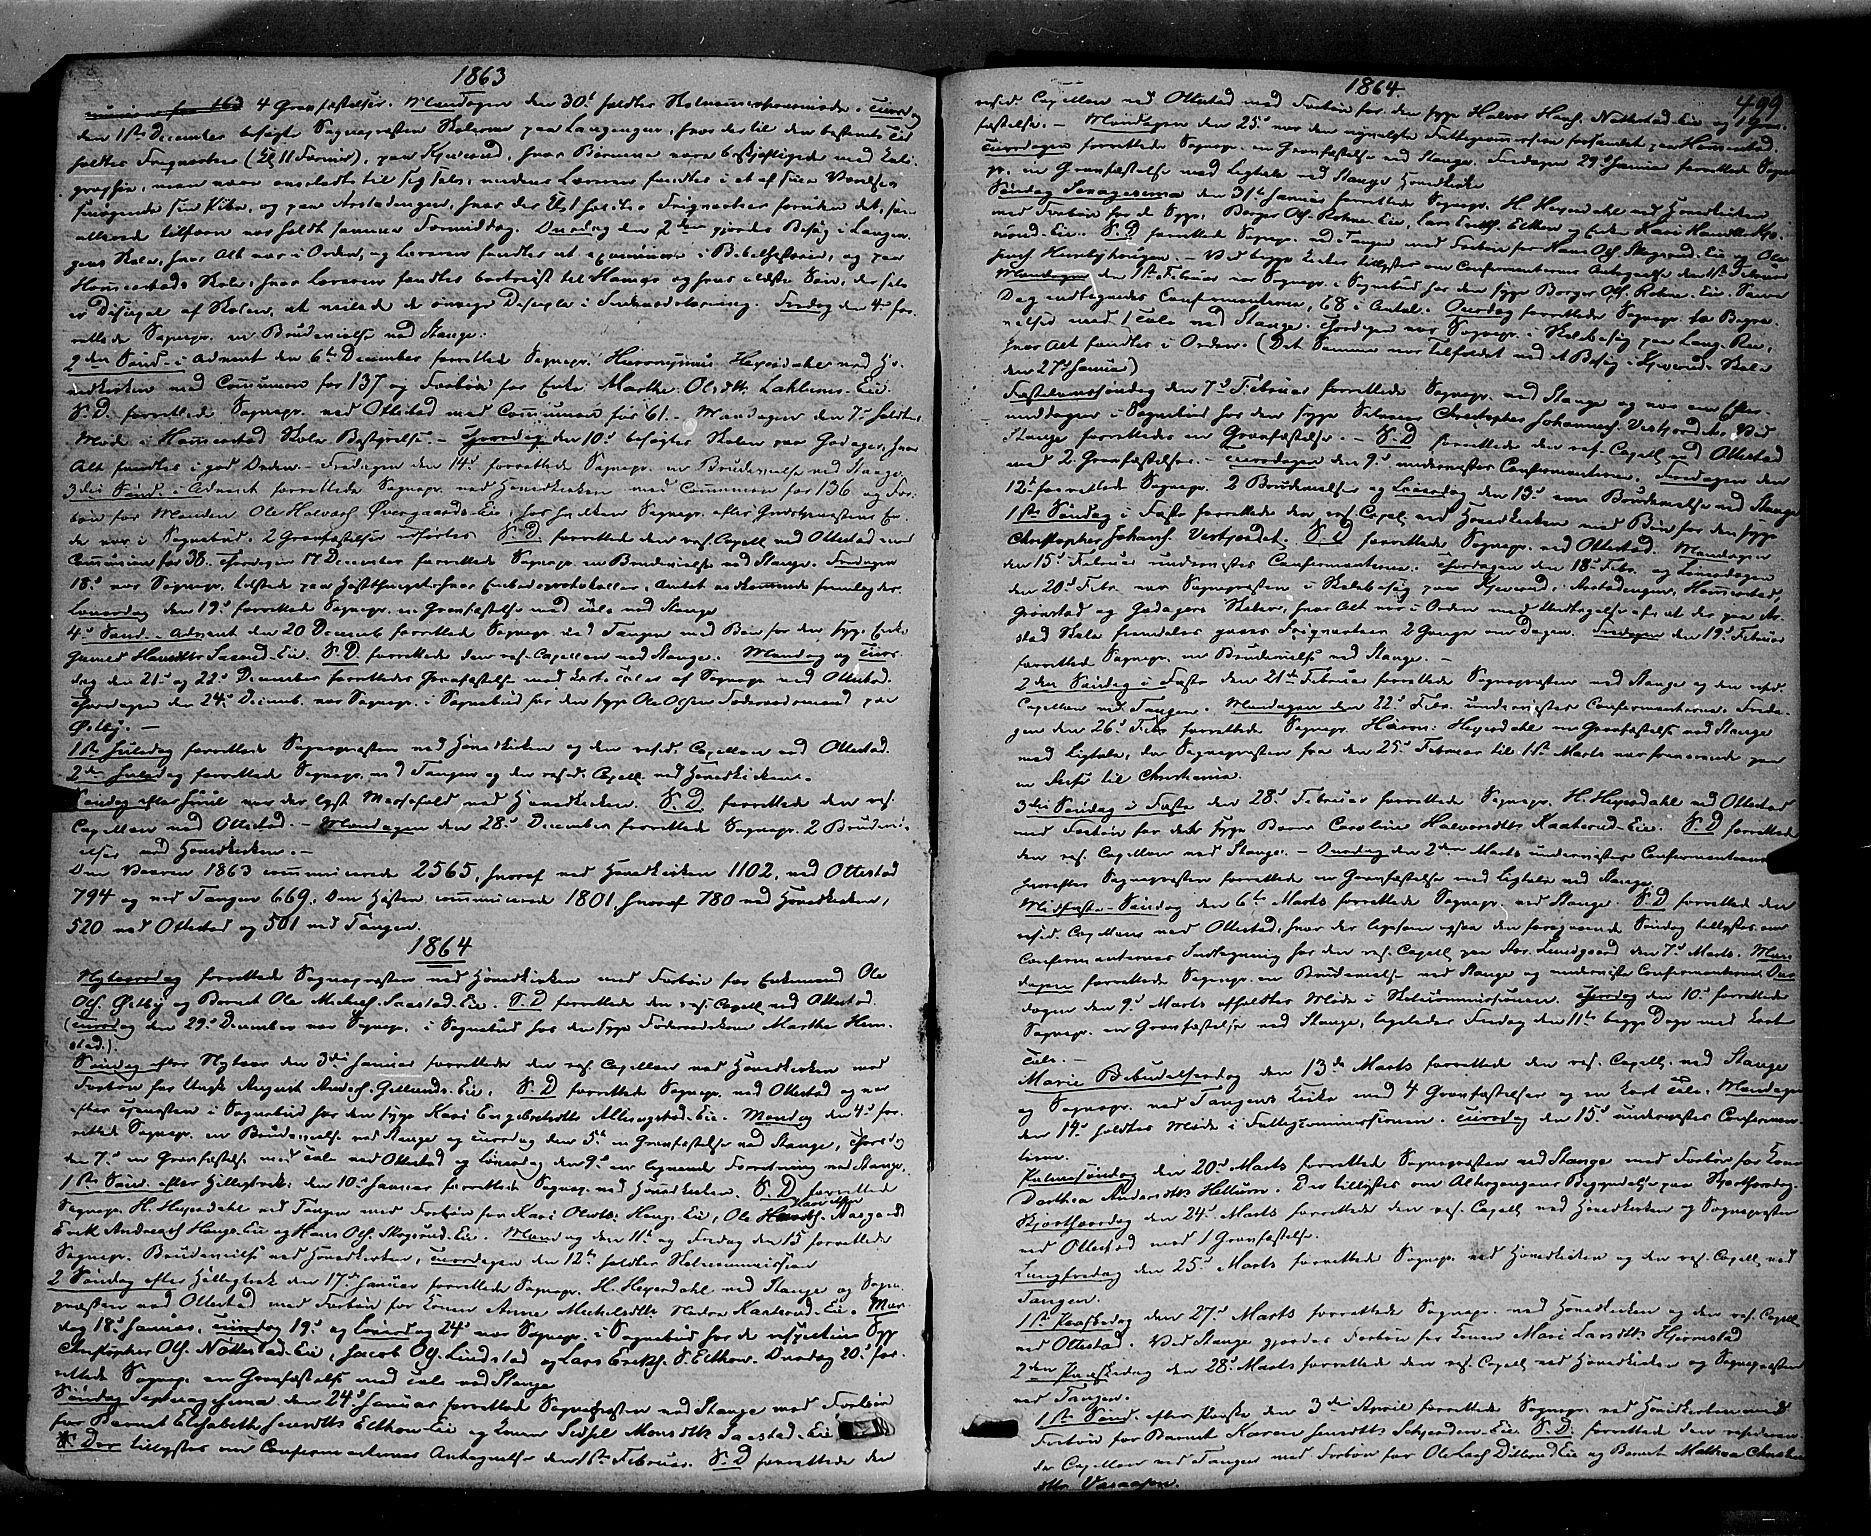 SAH, Stange prestekontor, K/L0013: Ministerialbok nr. 13, 1862-1879, s. 499